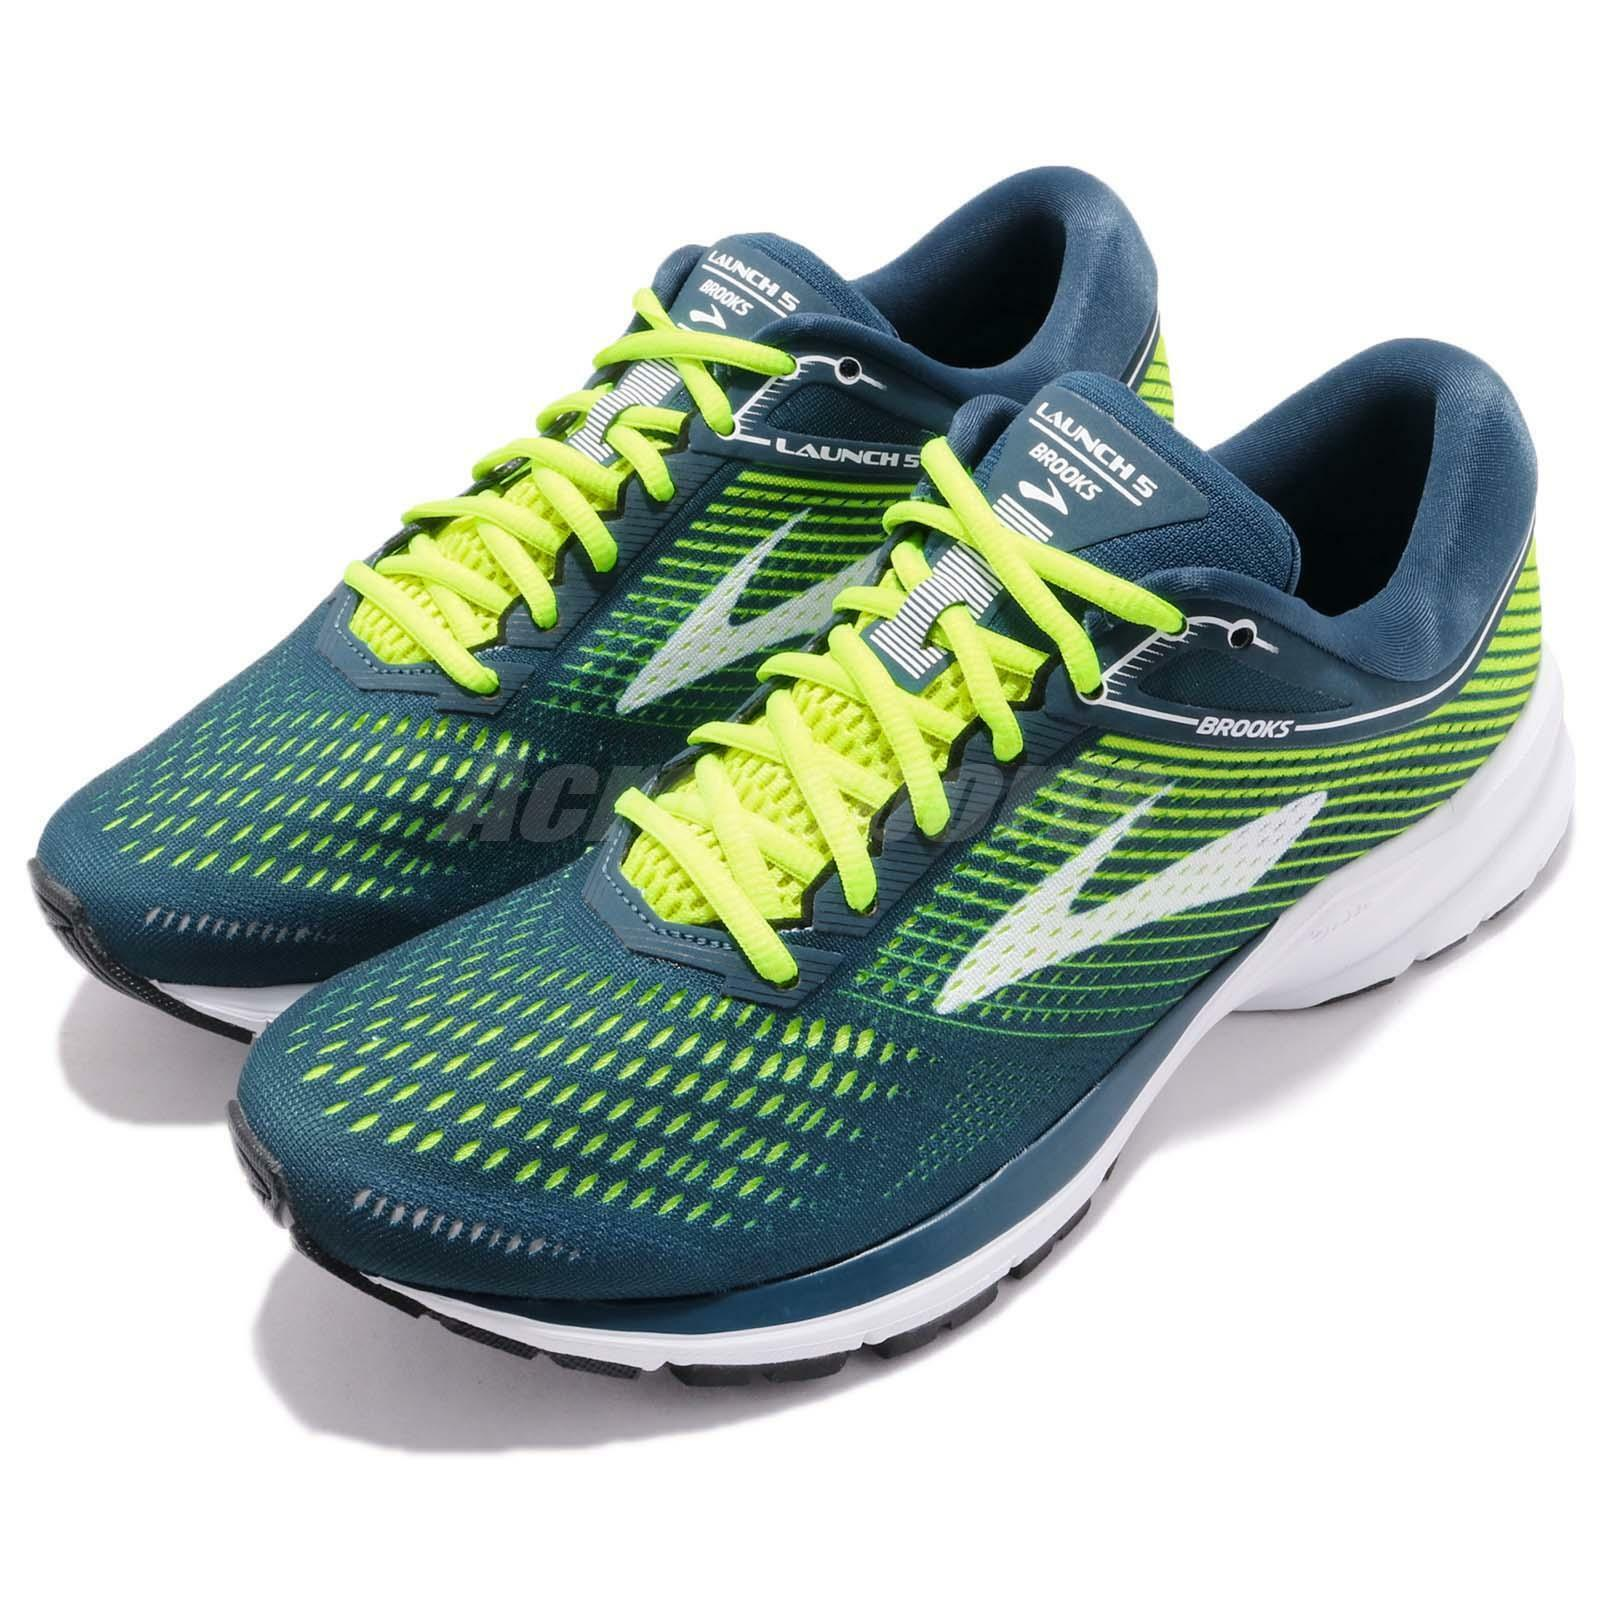 Brooks Launch 5 V Blue verde bianca Uomo Marathon Running Shoes Scarpe da Ginnastica 110278 1D